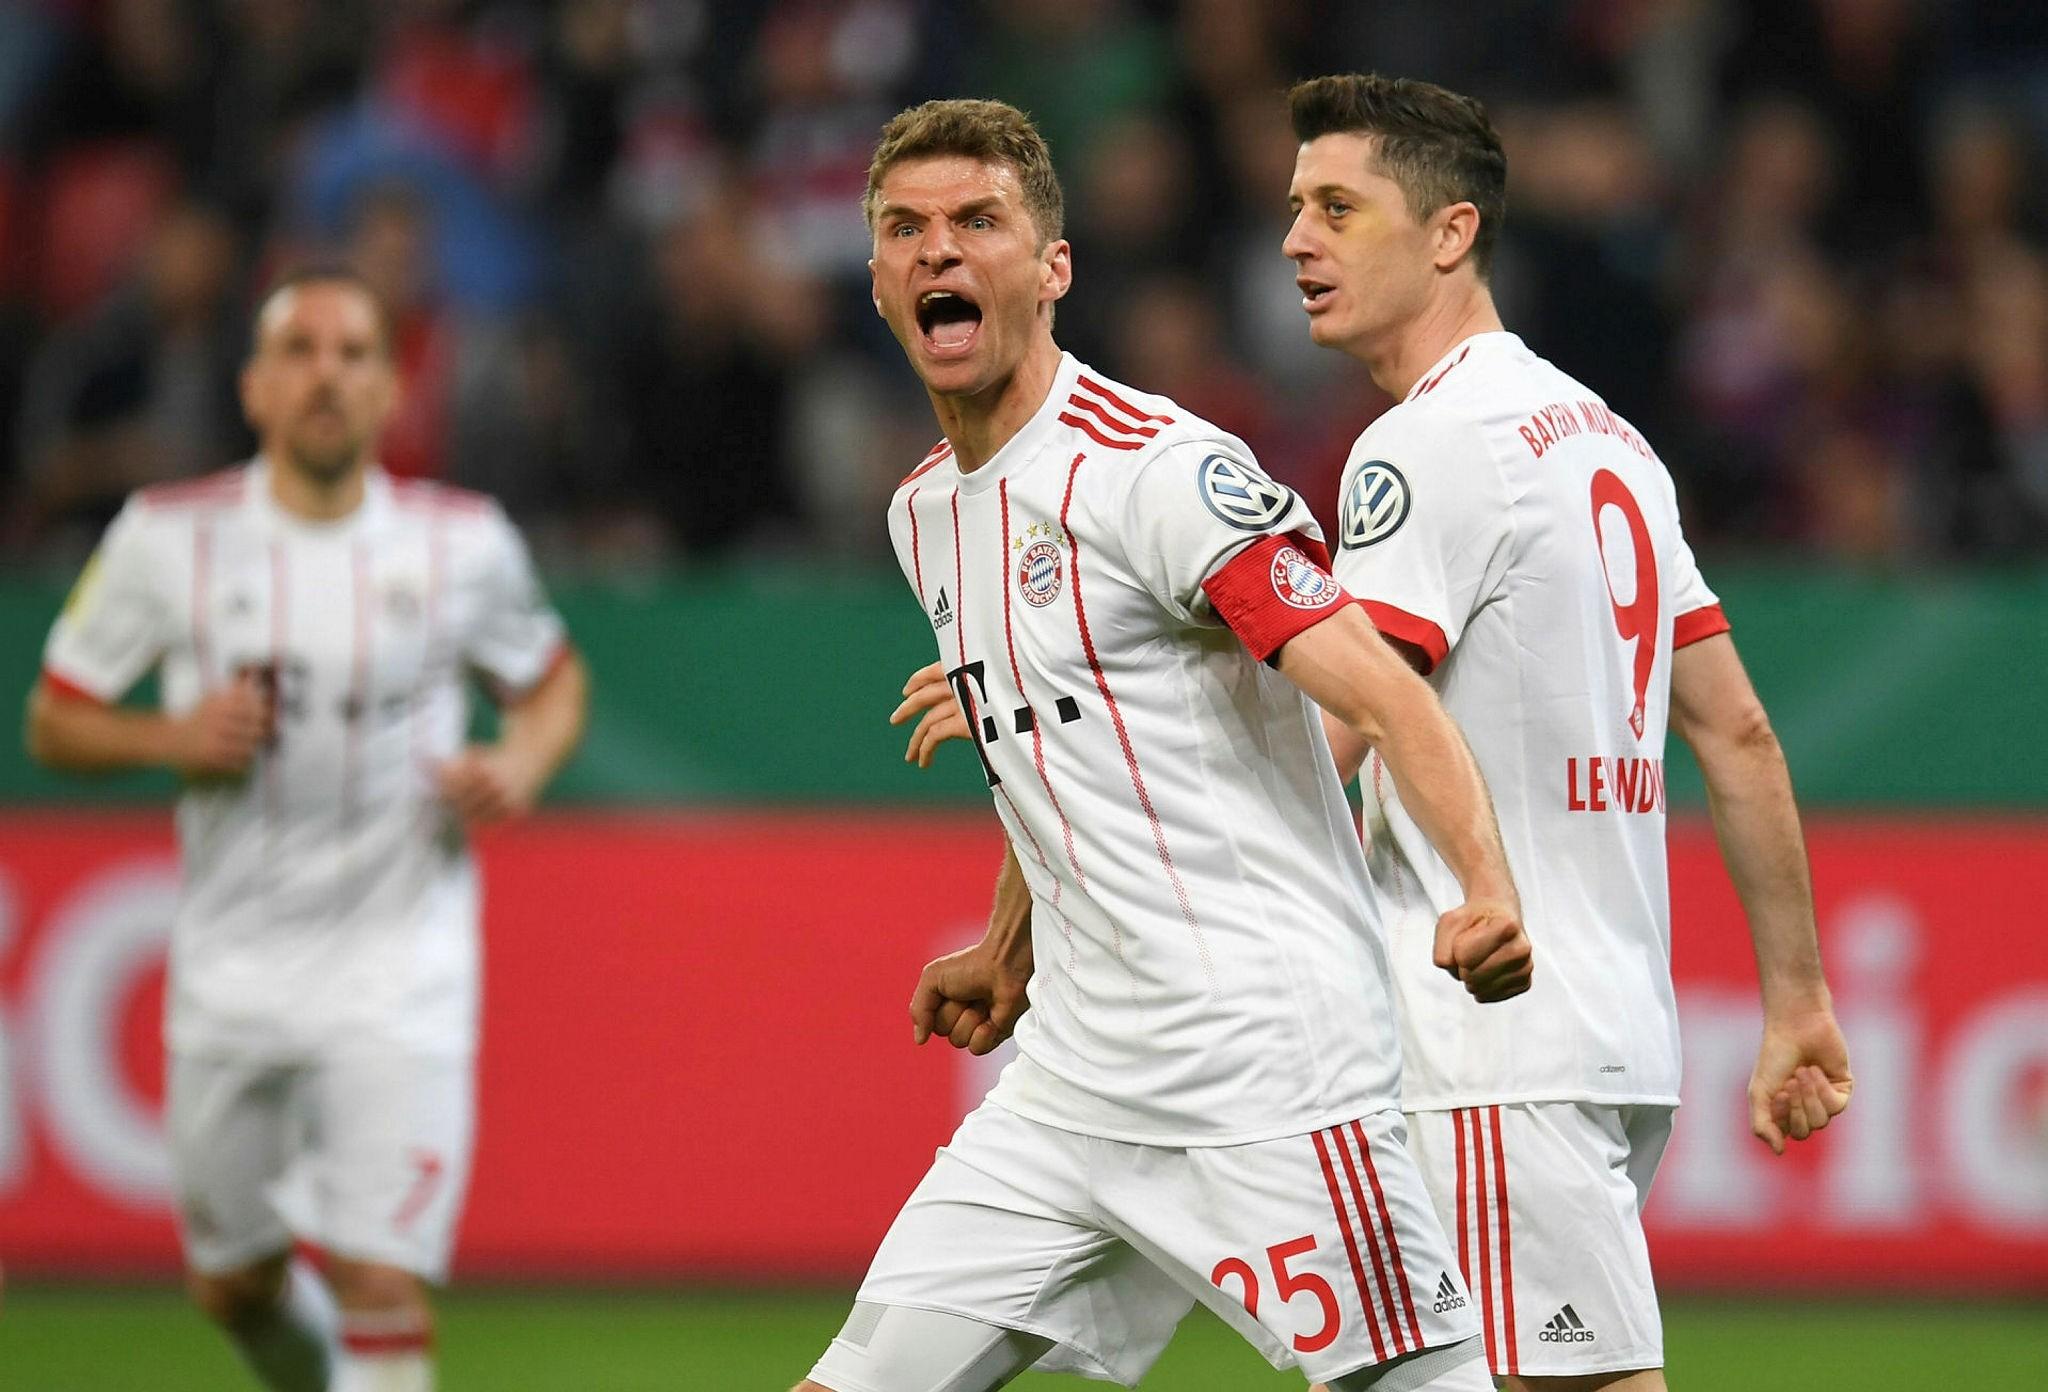 Bayern Munich's German forward Thomas Mueller (L) celebrates next to Polish forward Robert Lewandowski after scoring during the German football Cup DFB Pokal semifinal match Bayer 04 Leverkusen vs Bayern Munich in Leverkusen, Germany, April 17, 2018.